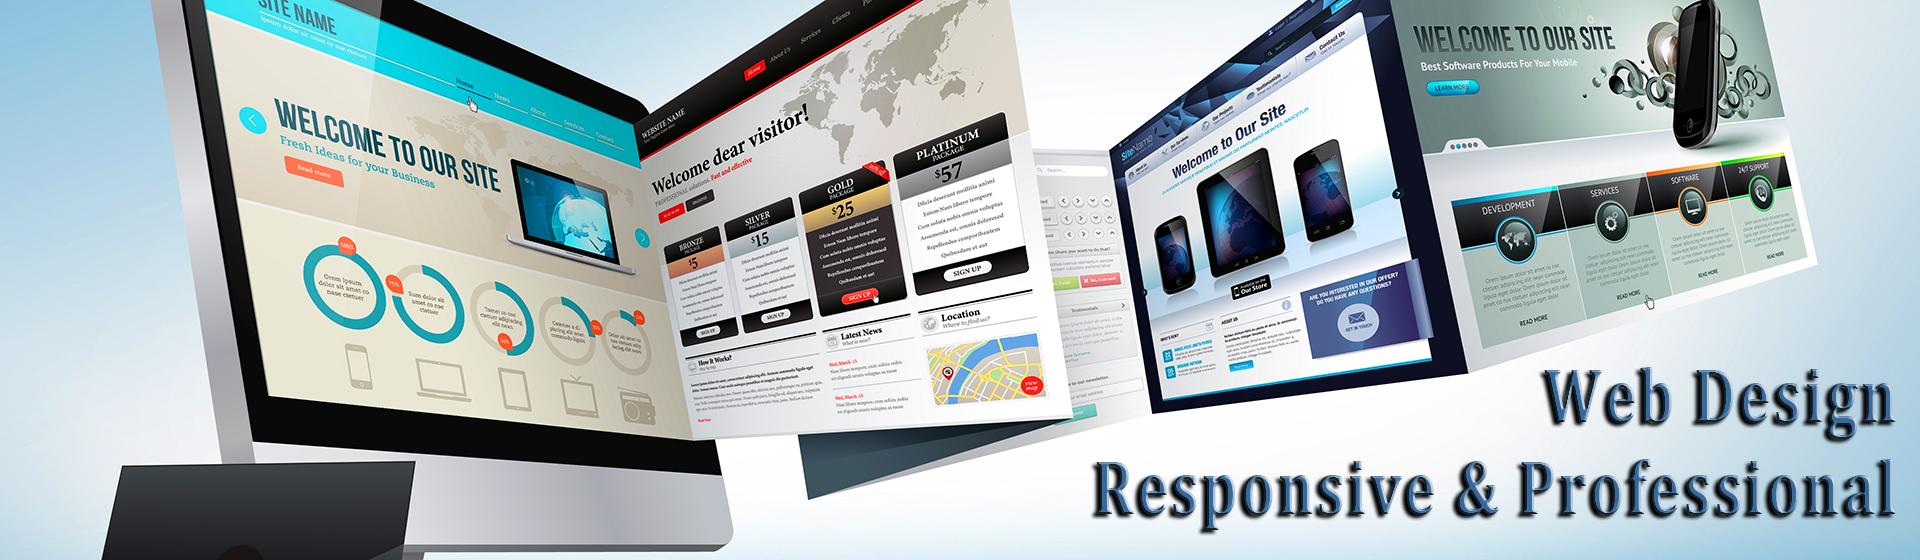 Saddlebrook Computer Solutions Web Design Responsive & Professional